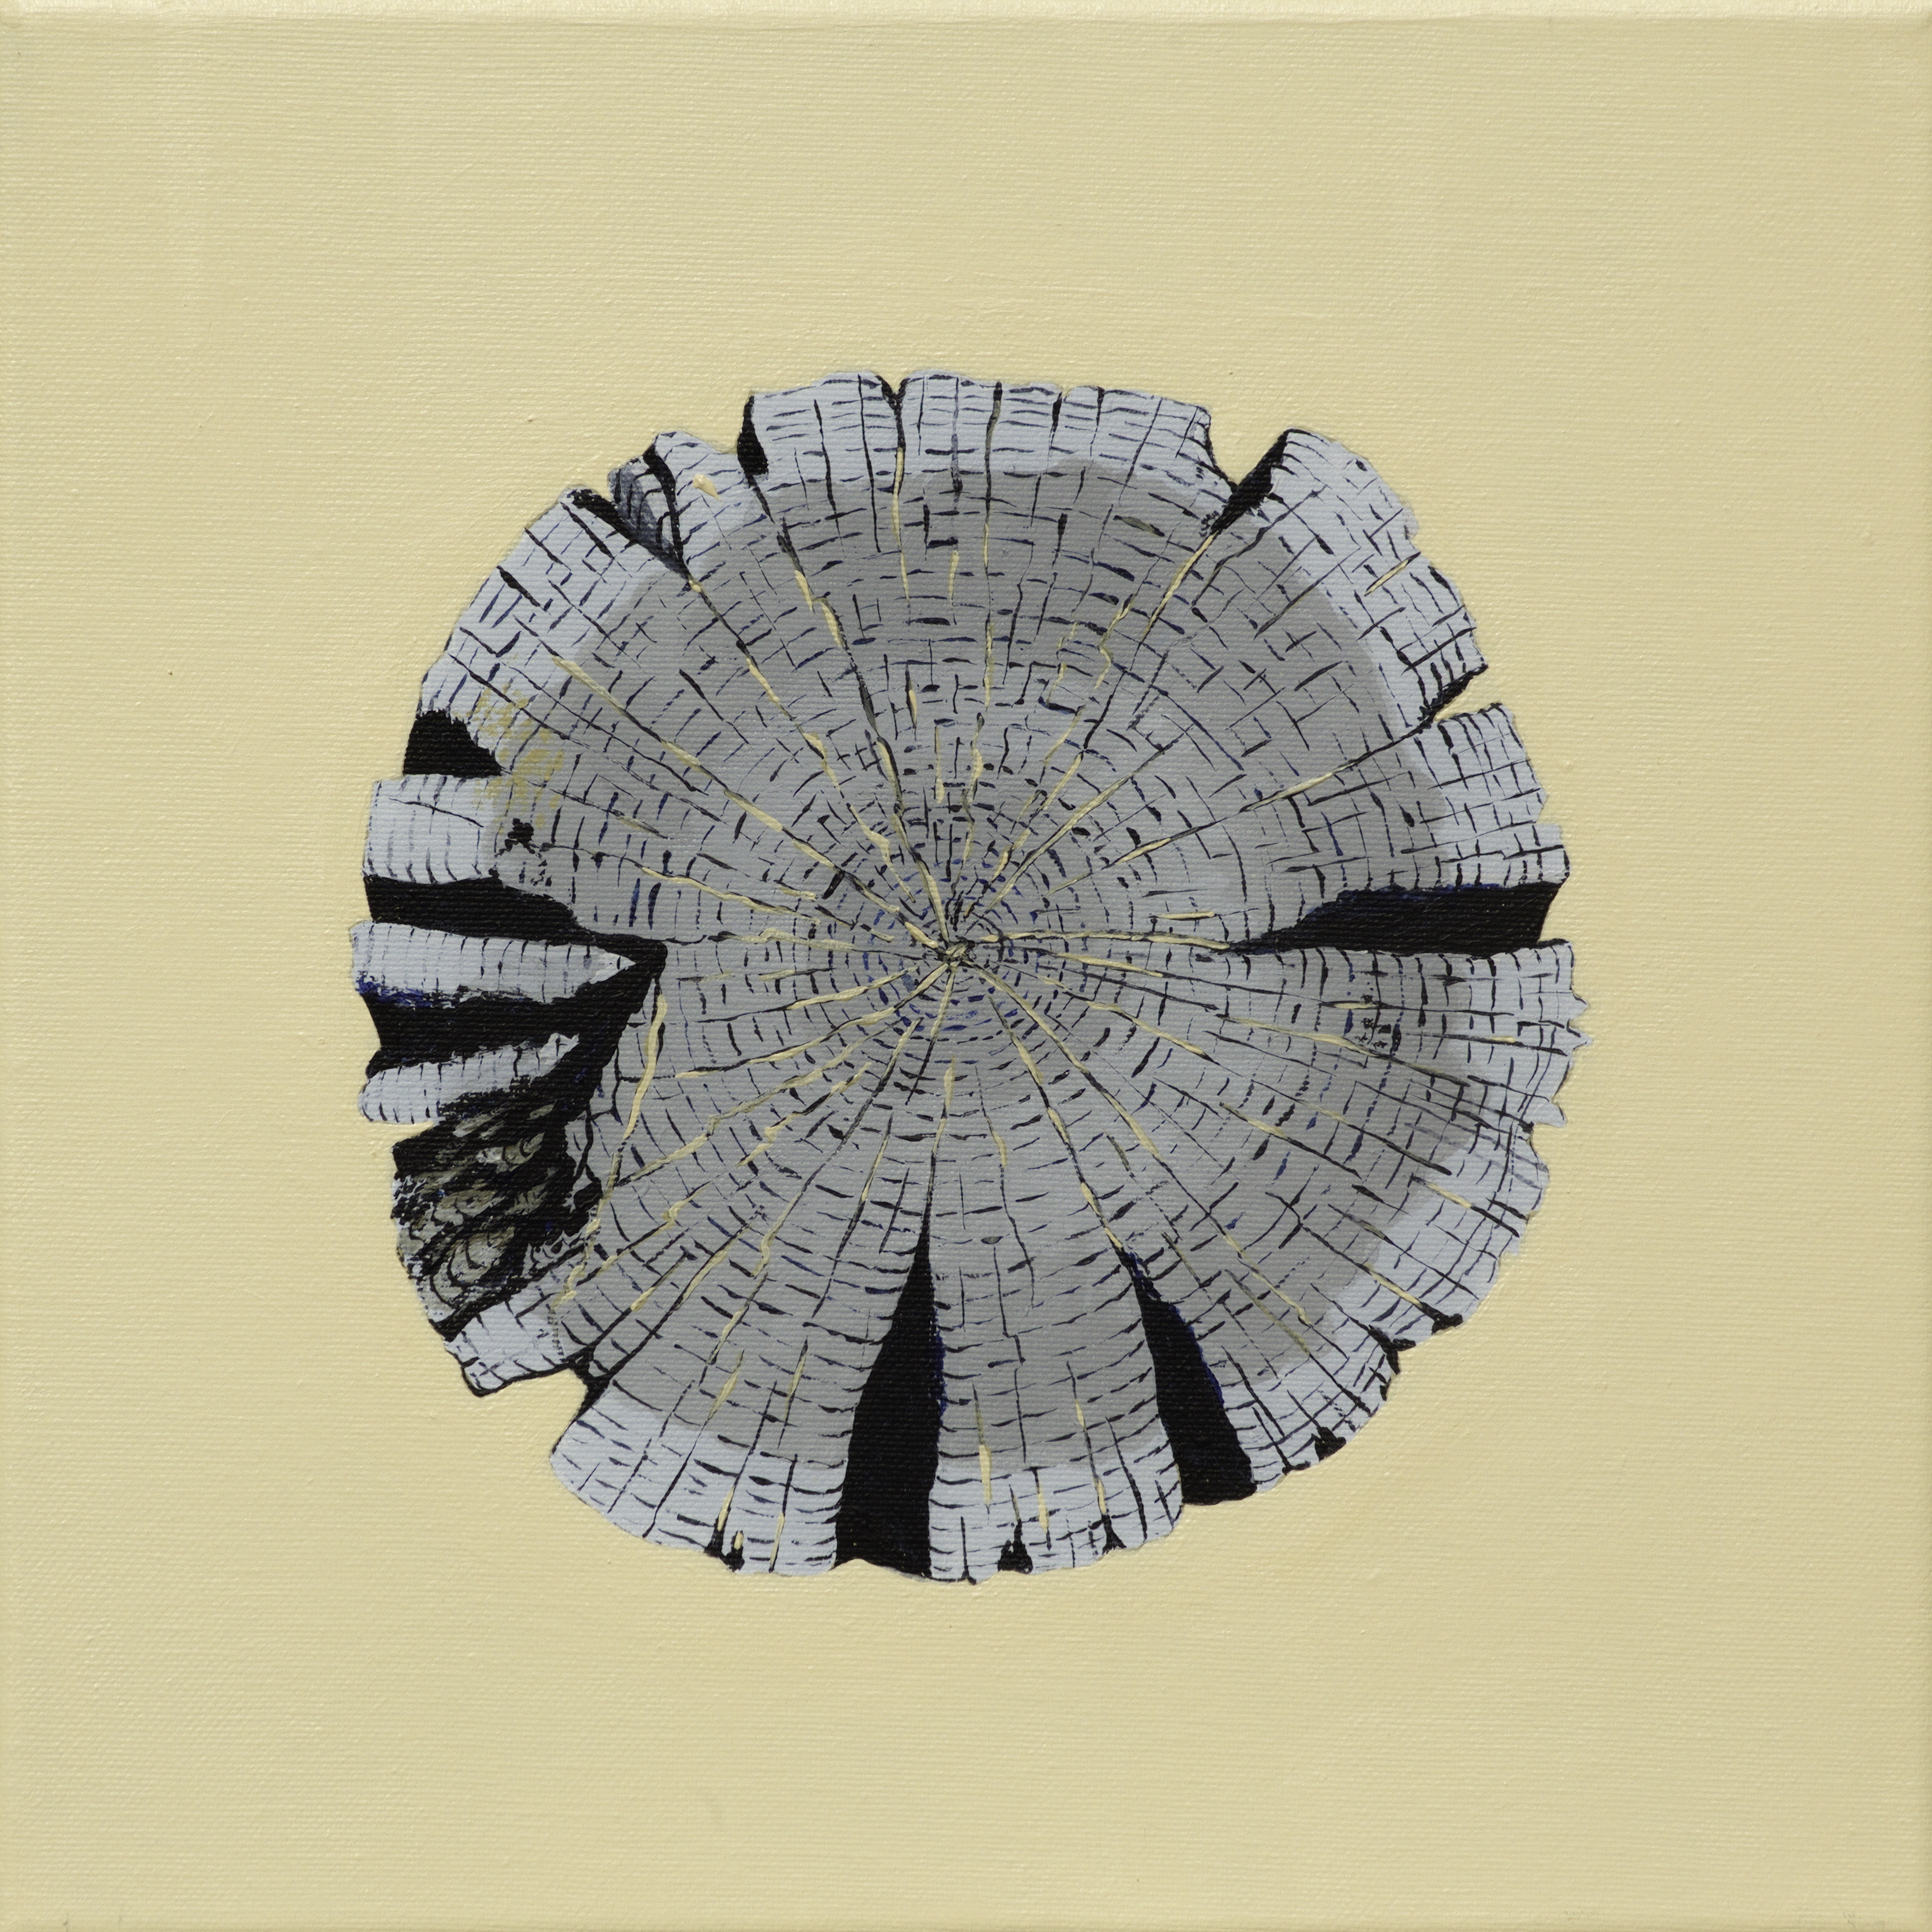 Paalkop 2 - acryl op canvas - 30 x 30 cm